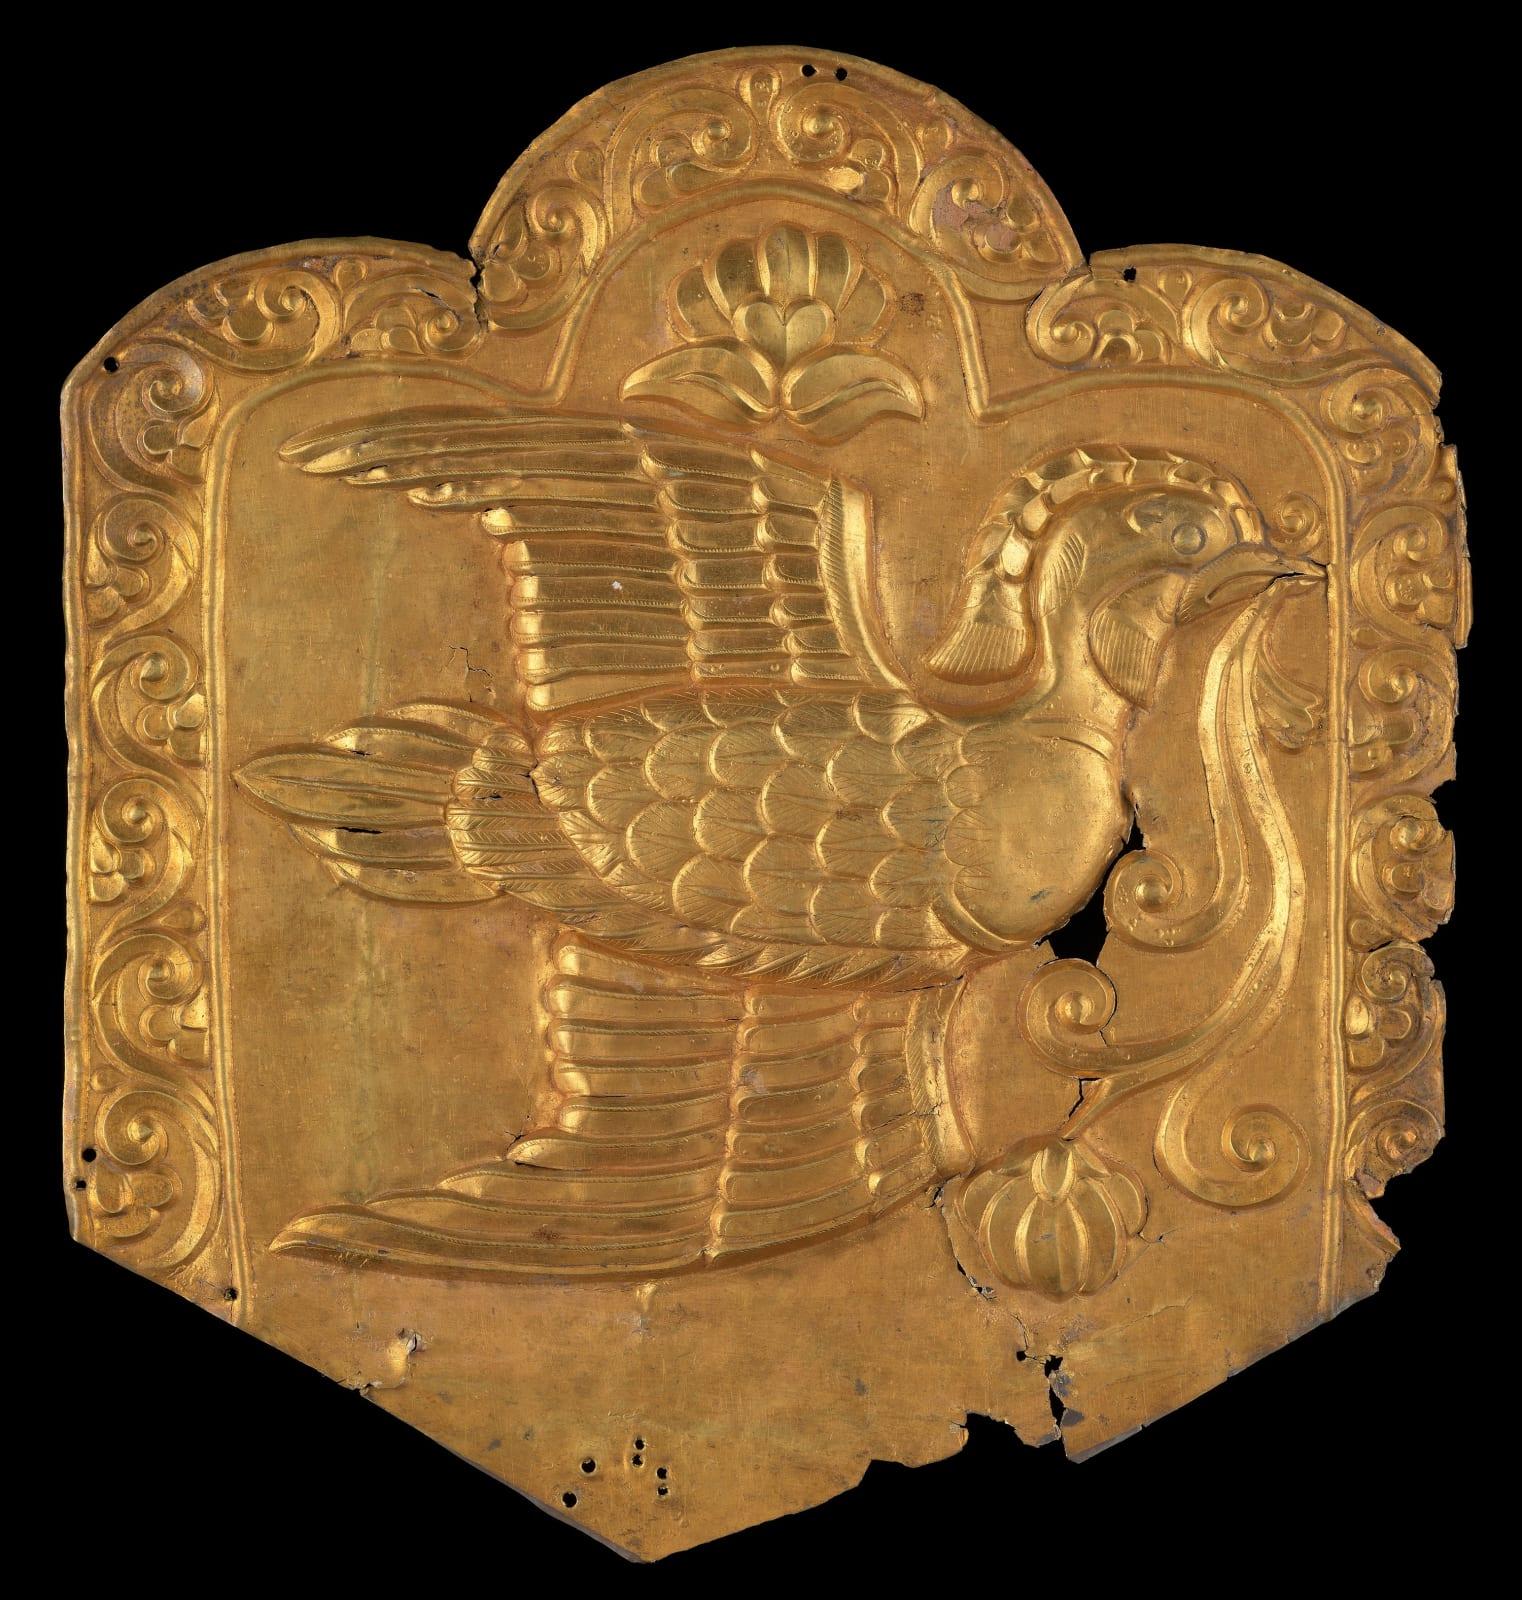 Silver-gilt repoussé plaque depicting a mandarin duck in flight, Central Asia, 7th – 9th century